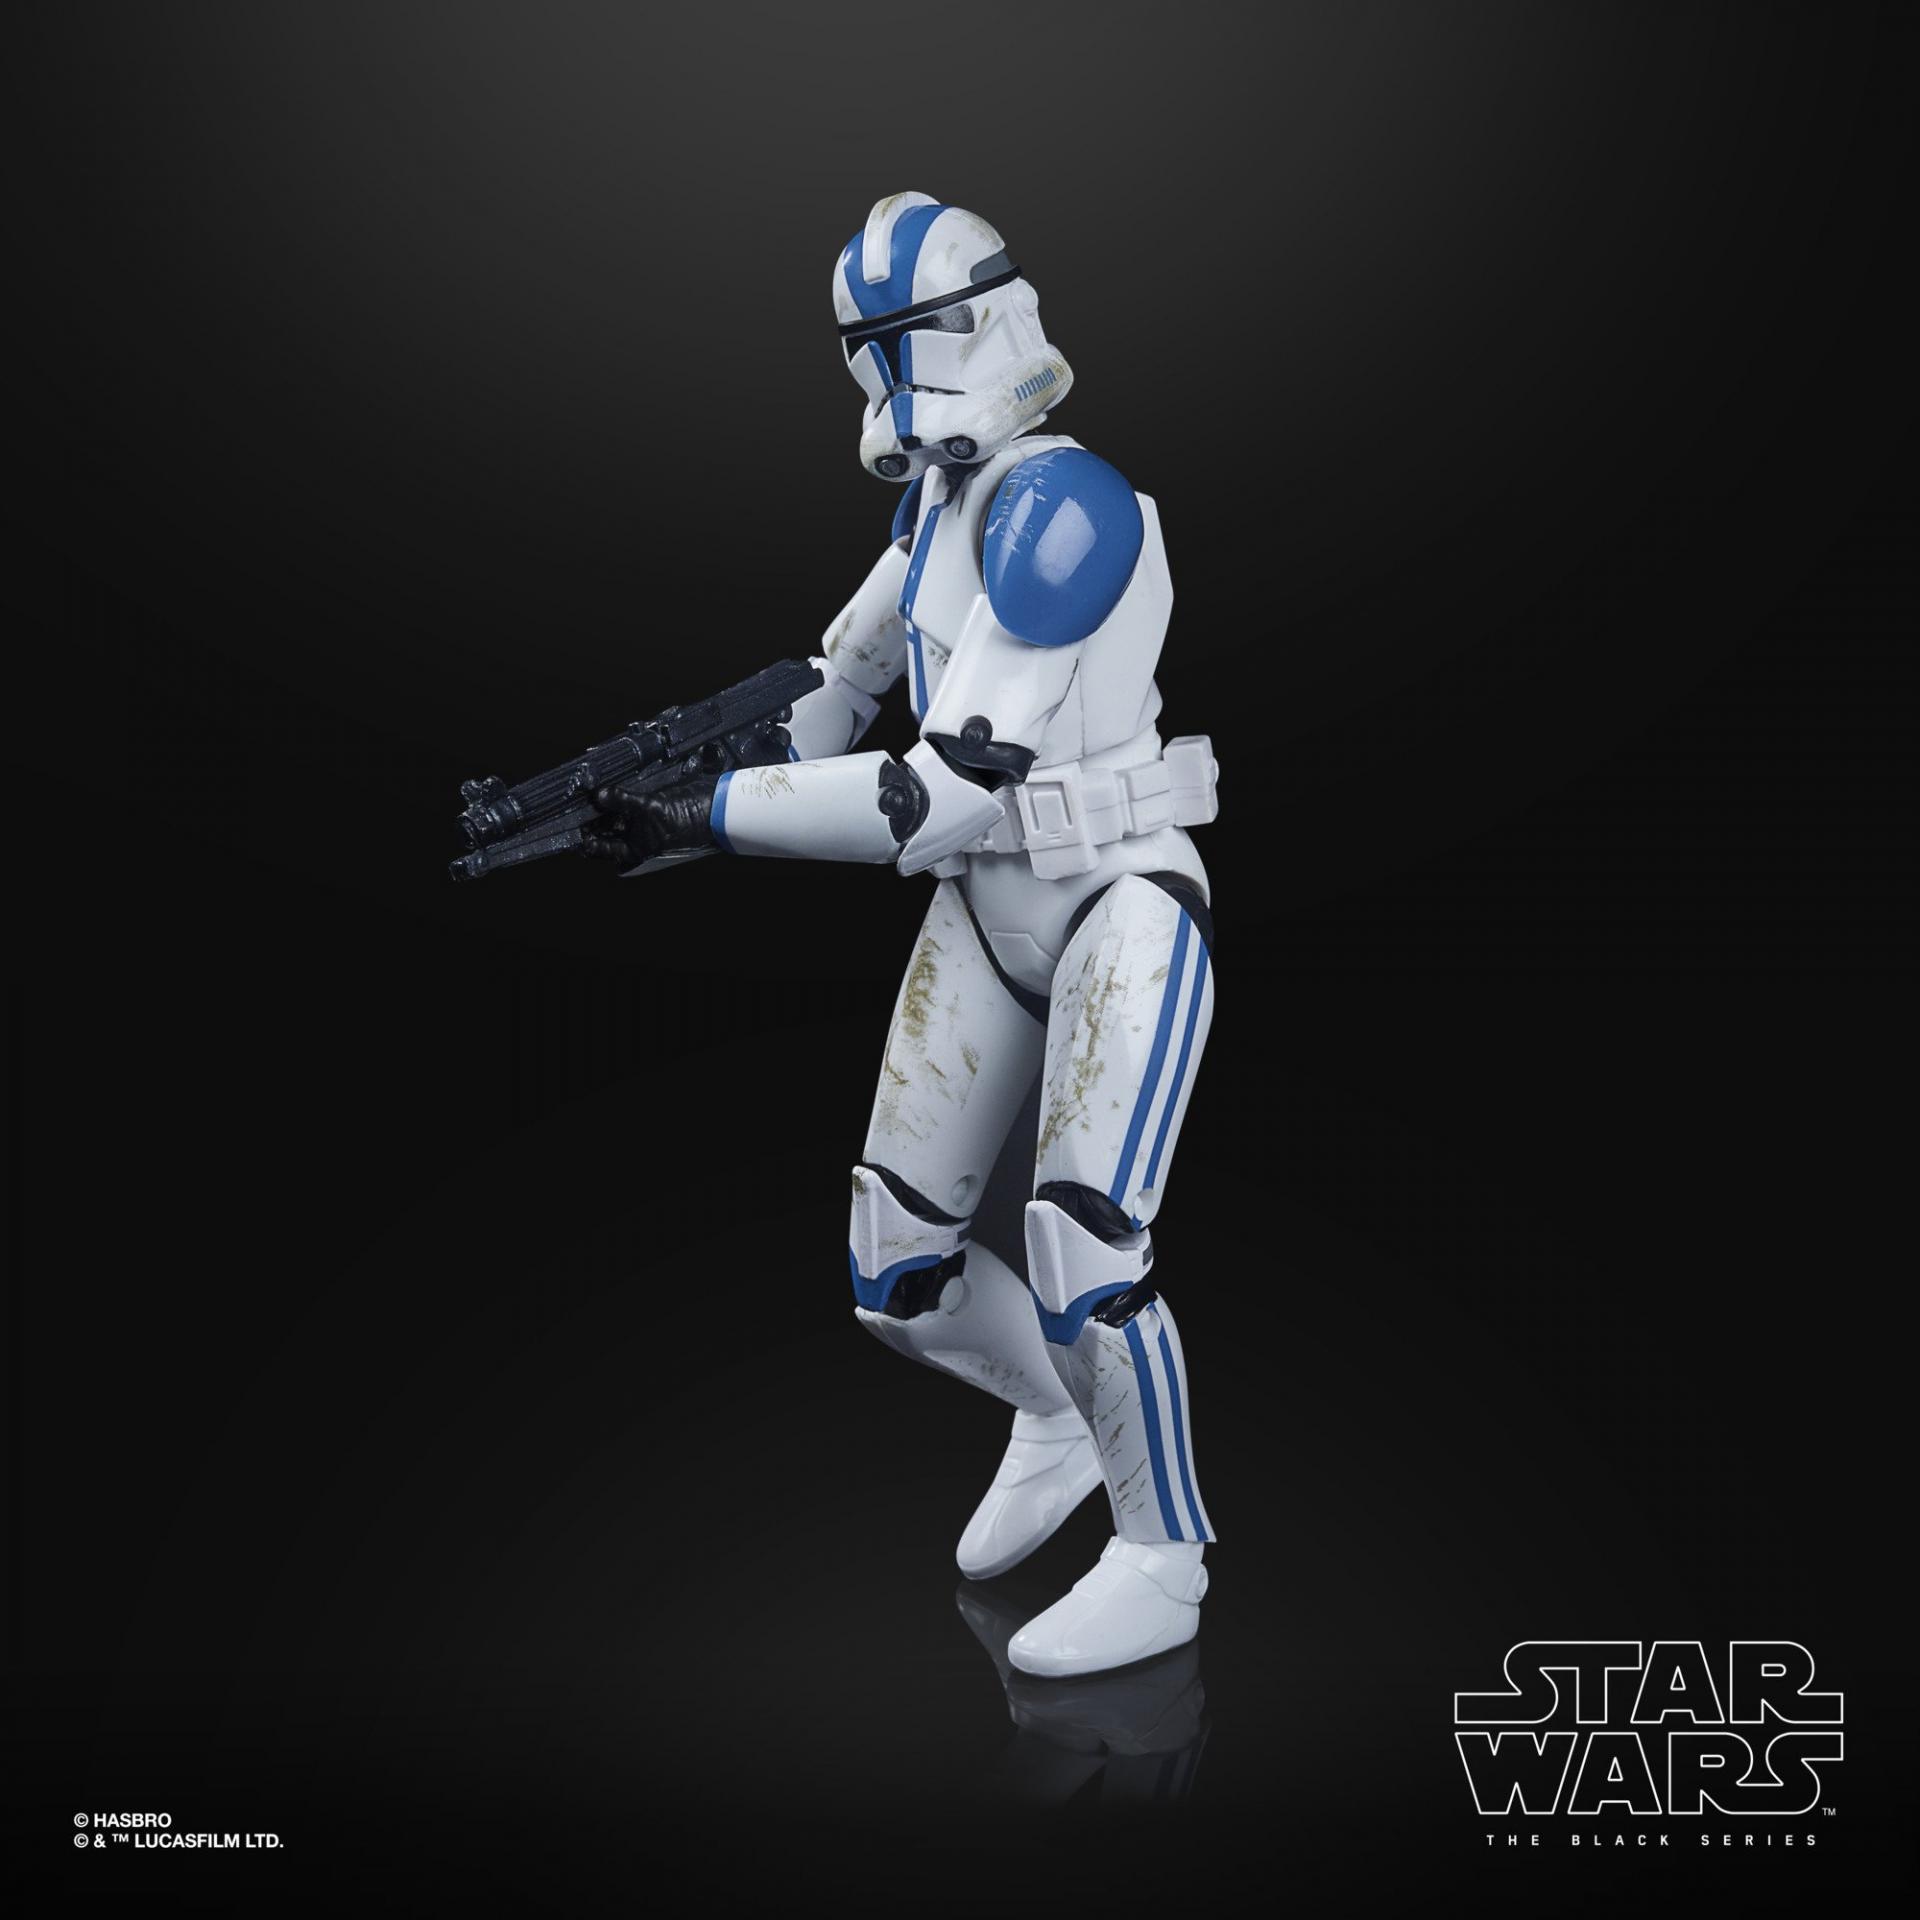 Star wars the black series archive 501st legion clone trooper 15cm5